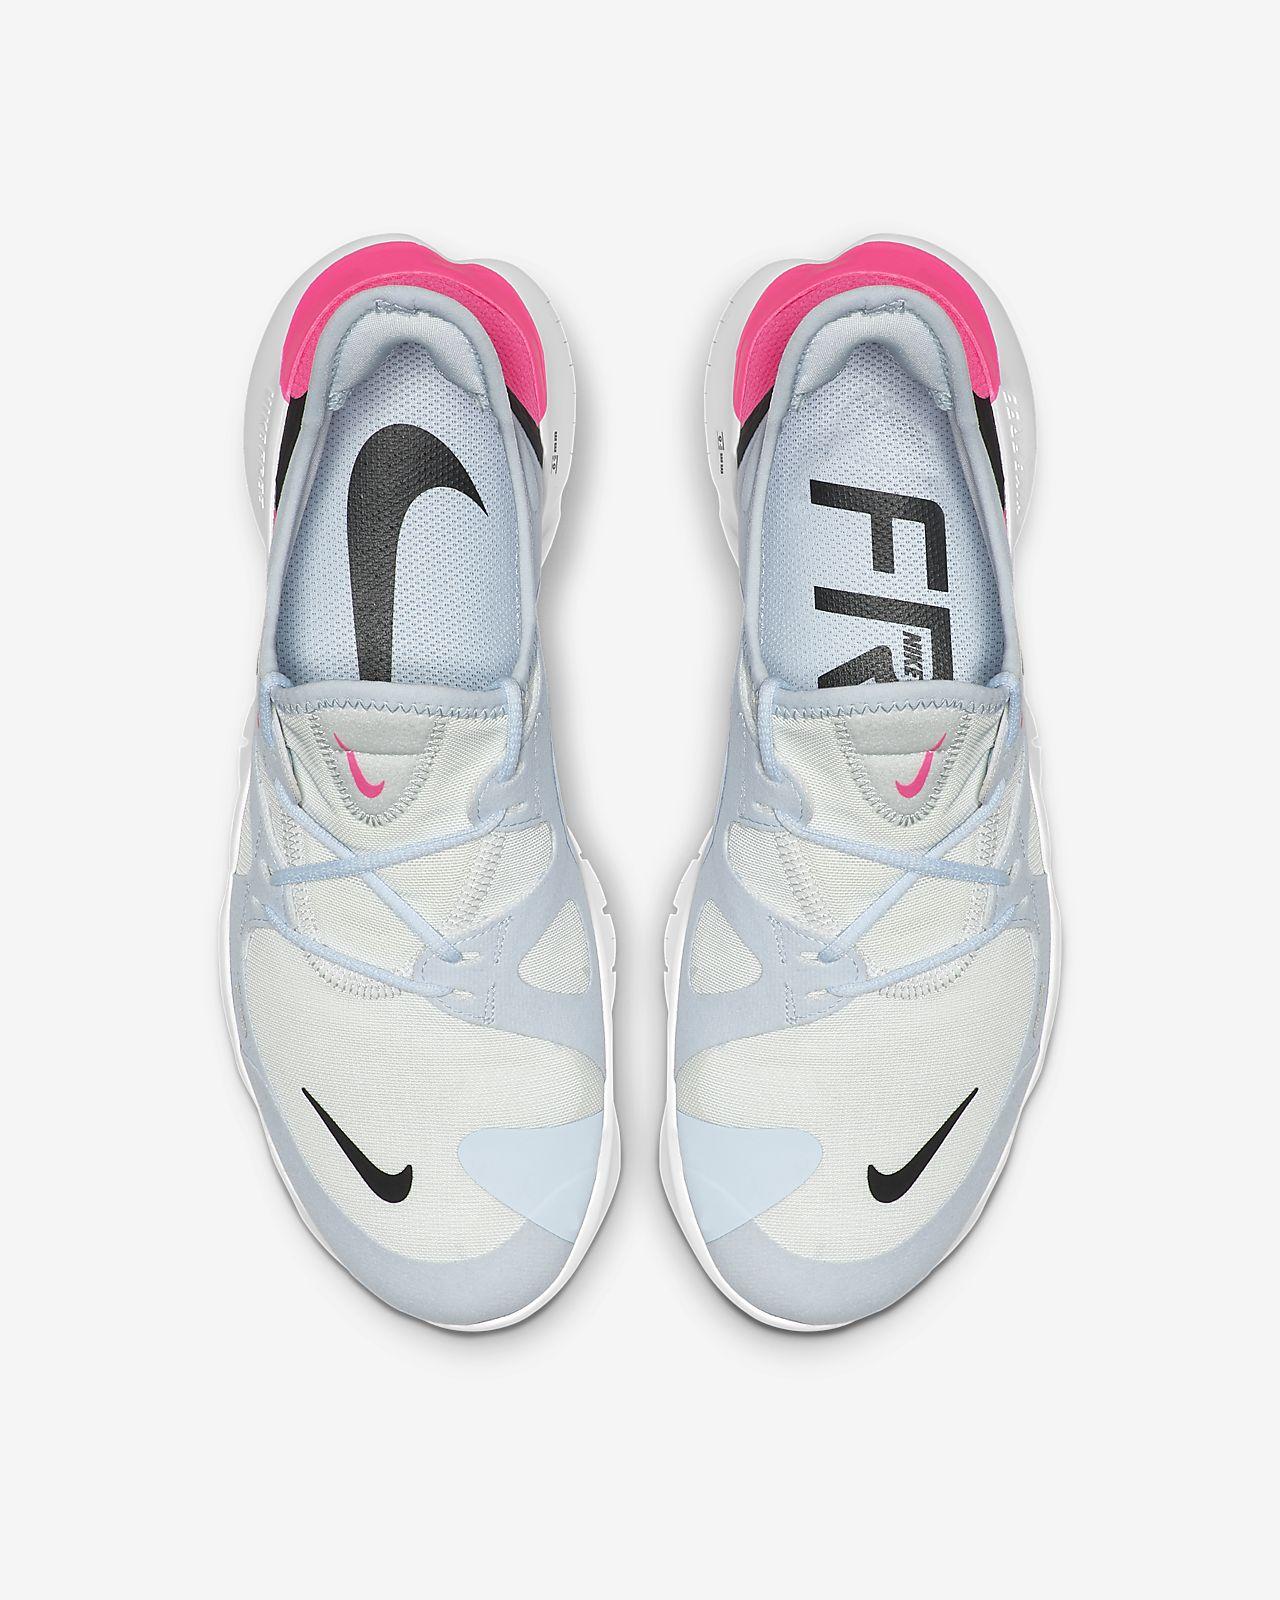 c7eeed220aad Nike Free RN 5.0 Women s Running Shoe. Nike.com LU